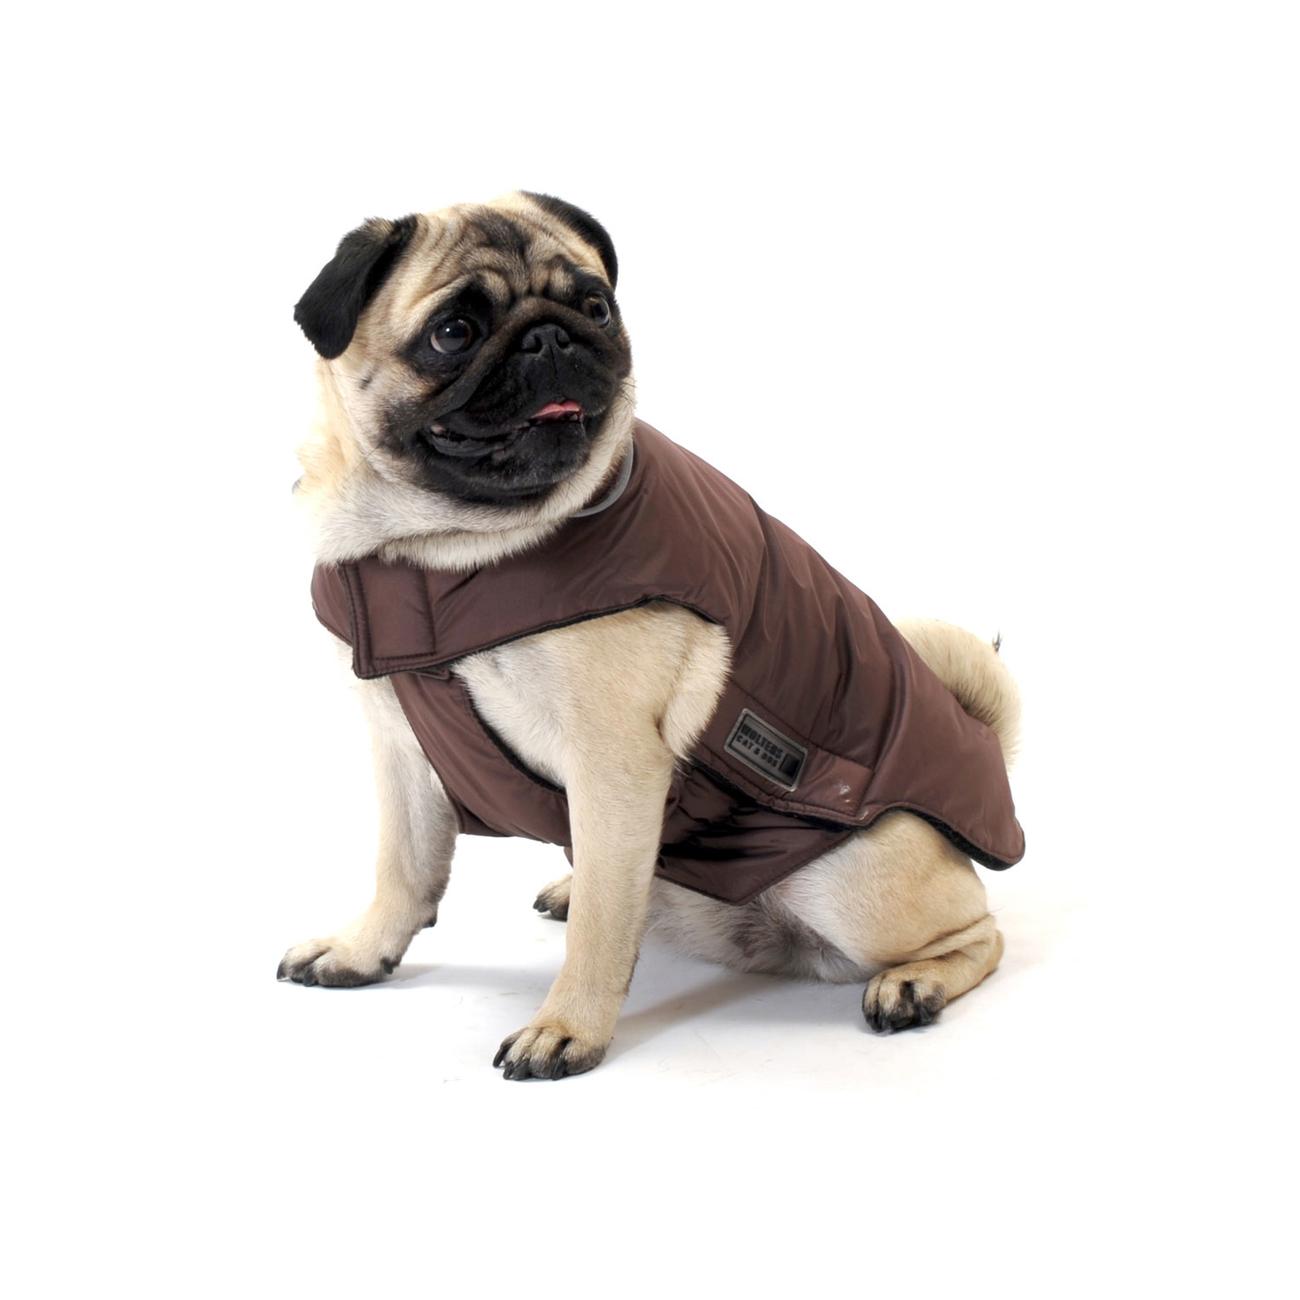 Wolters Hundemantel Outdoorjacke Jack für Mops & Co, Bild 5